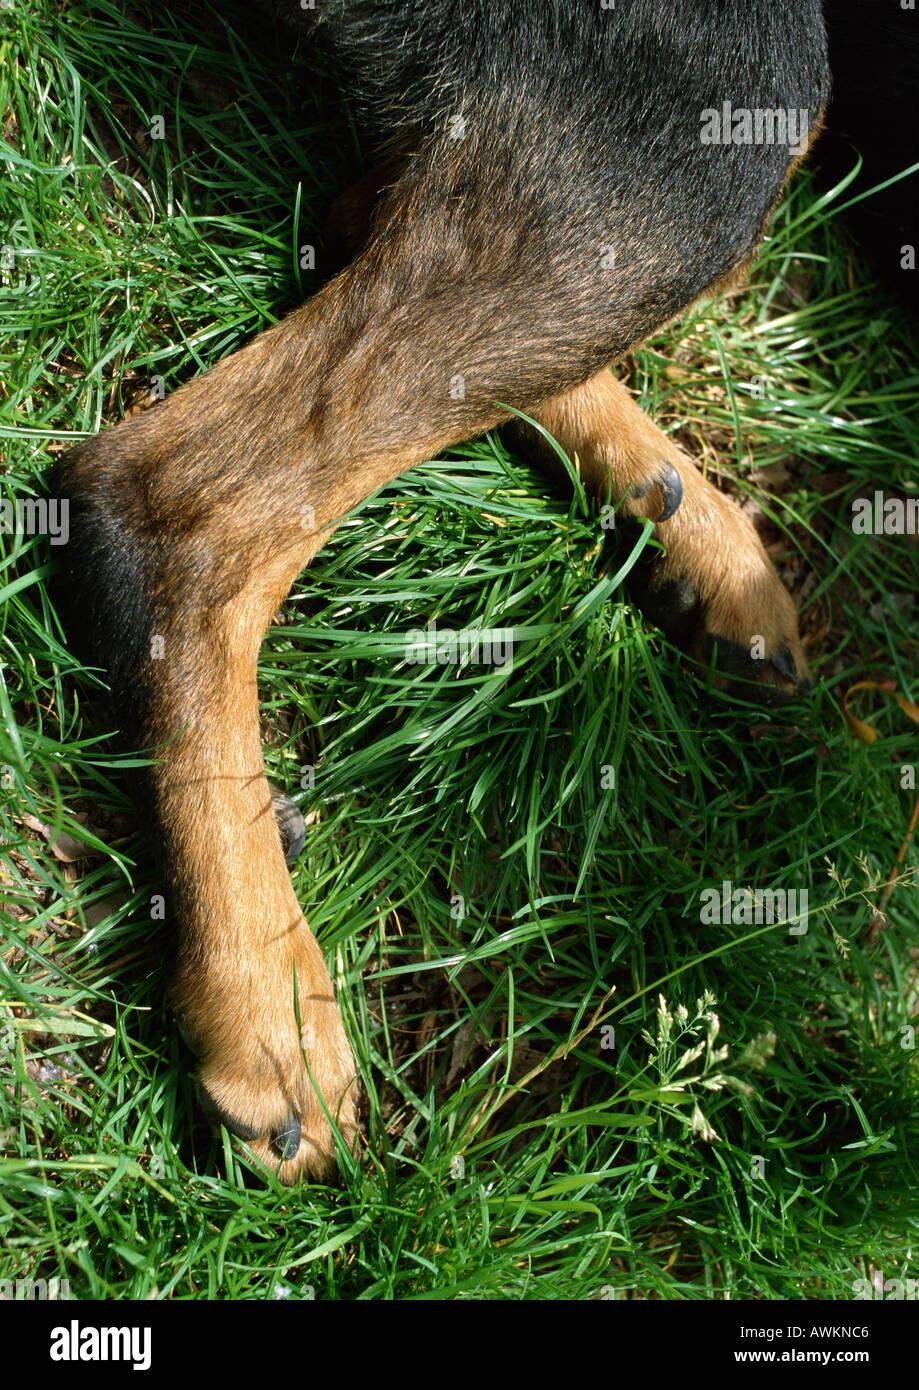 [Image: dogs-hind-legs-lying-down-AWKNC6.jpg]